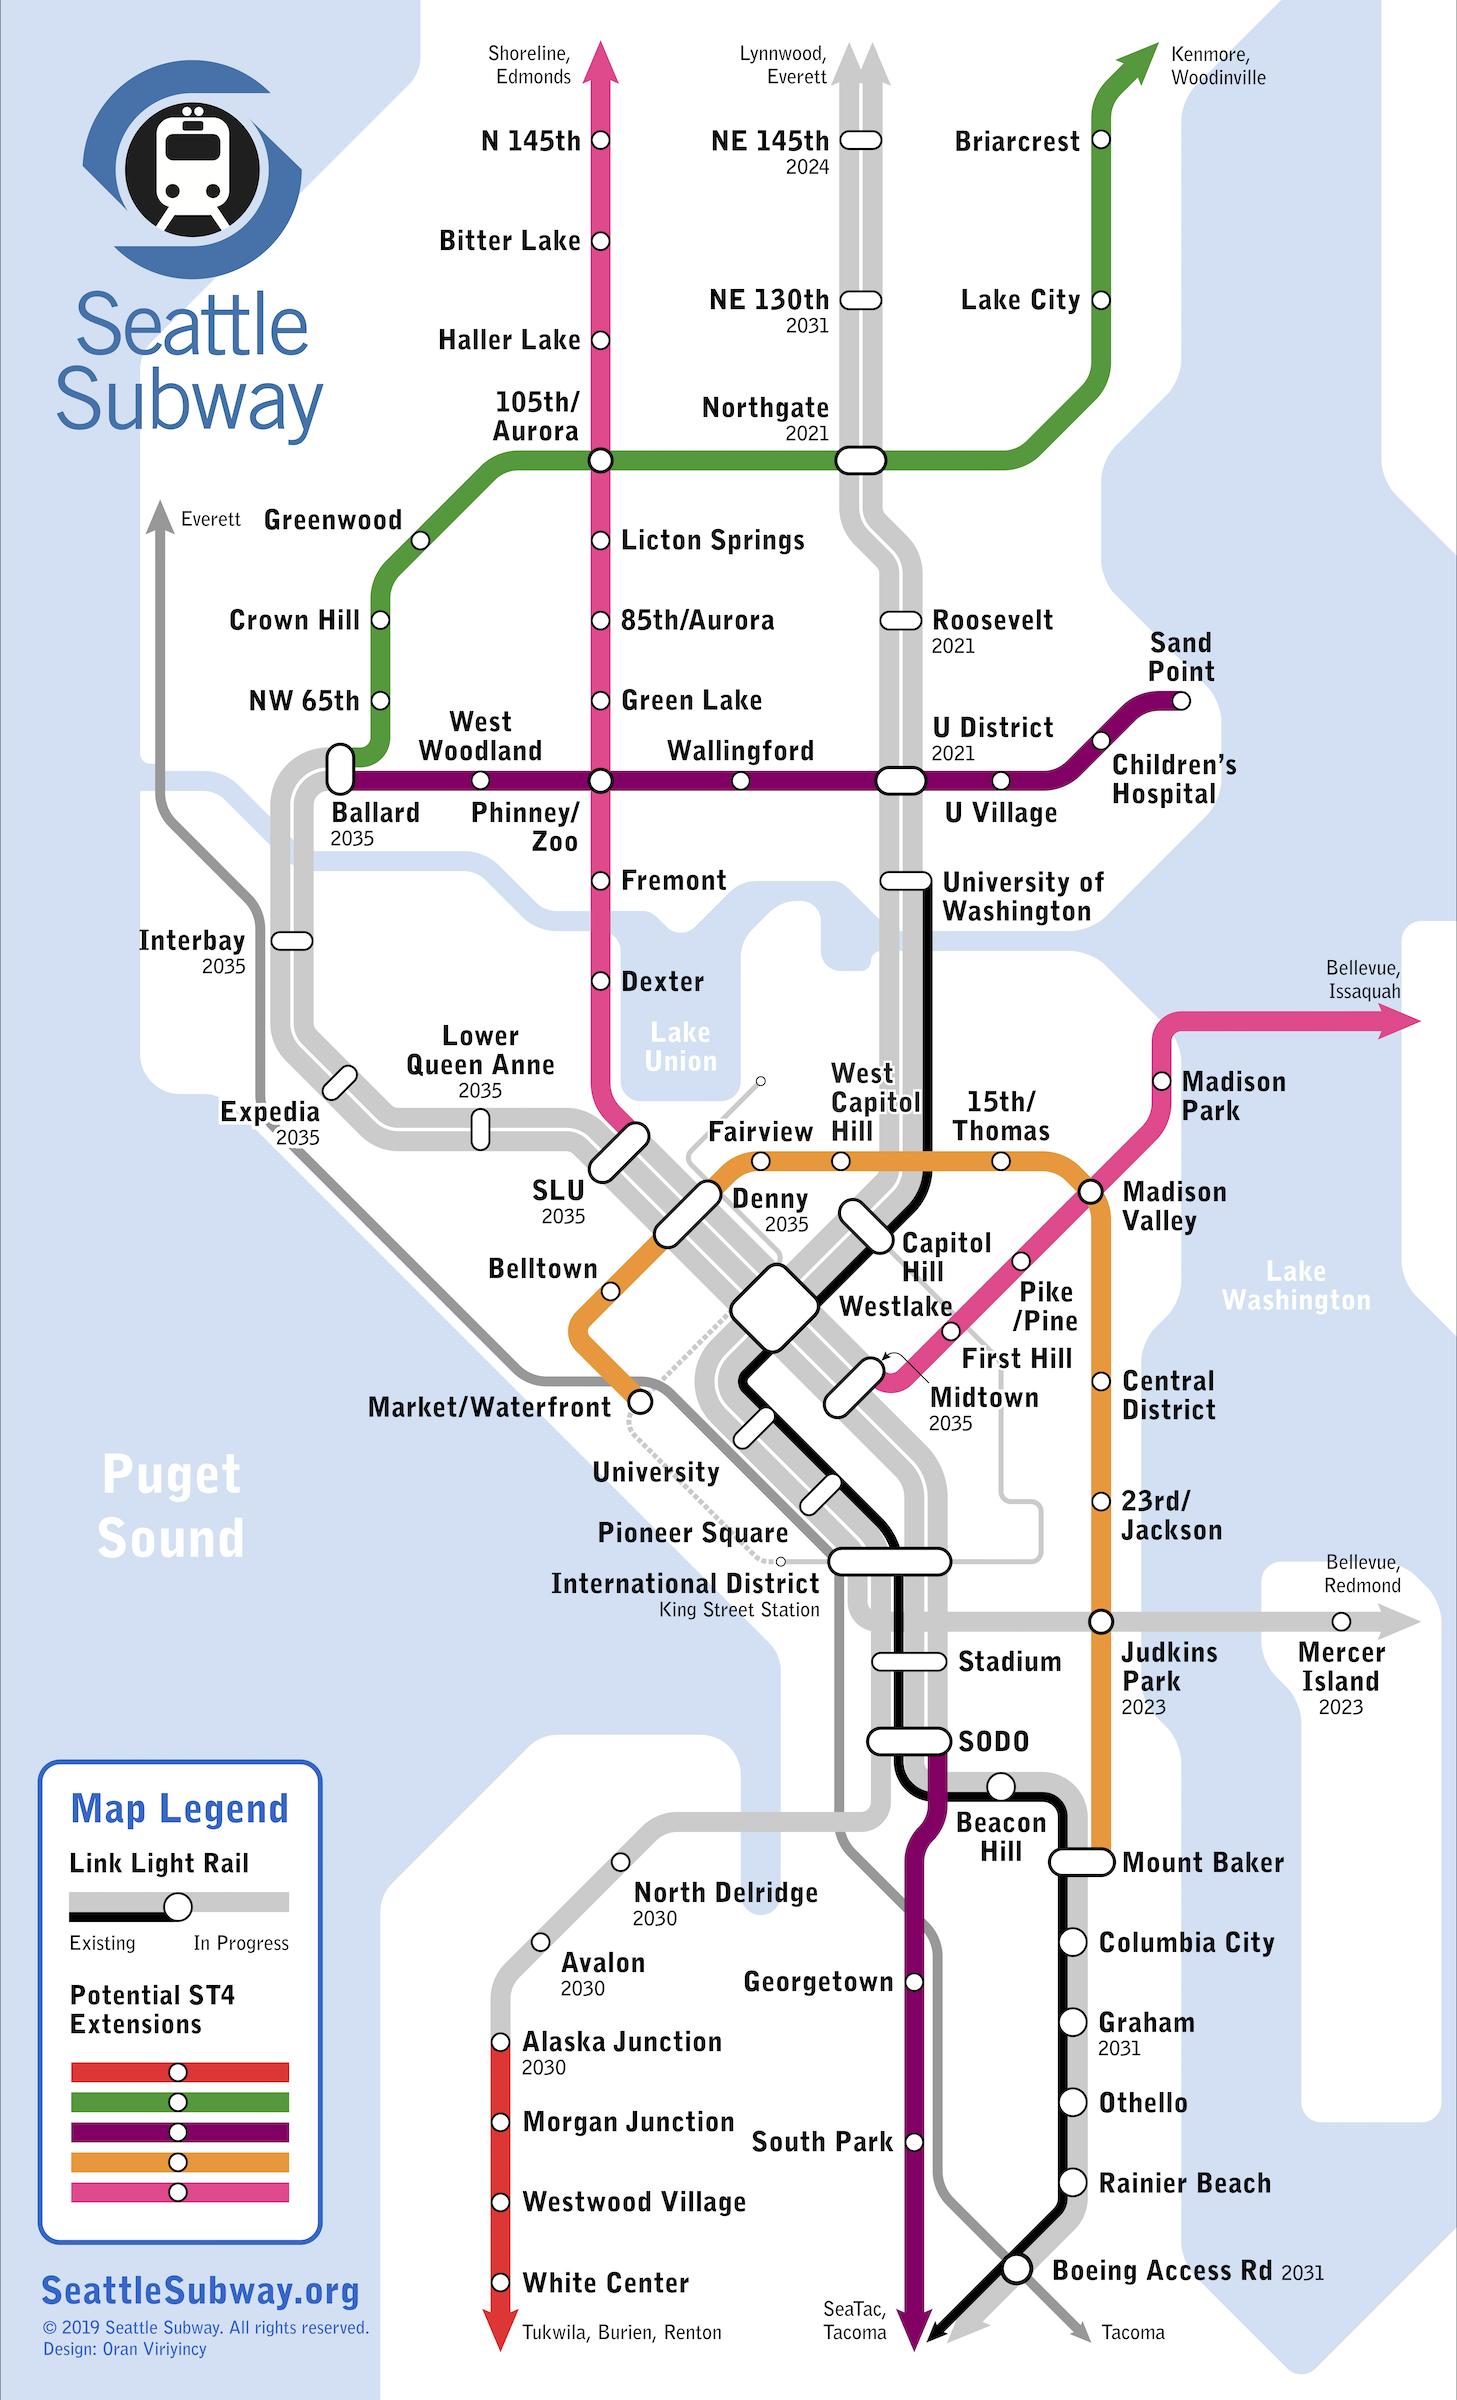 Seattle: It's time to start work on ST4 – Seattle Transit Blog on